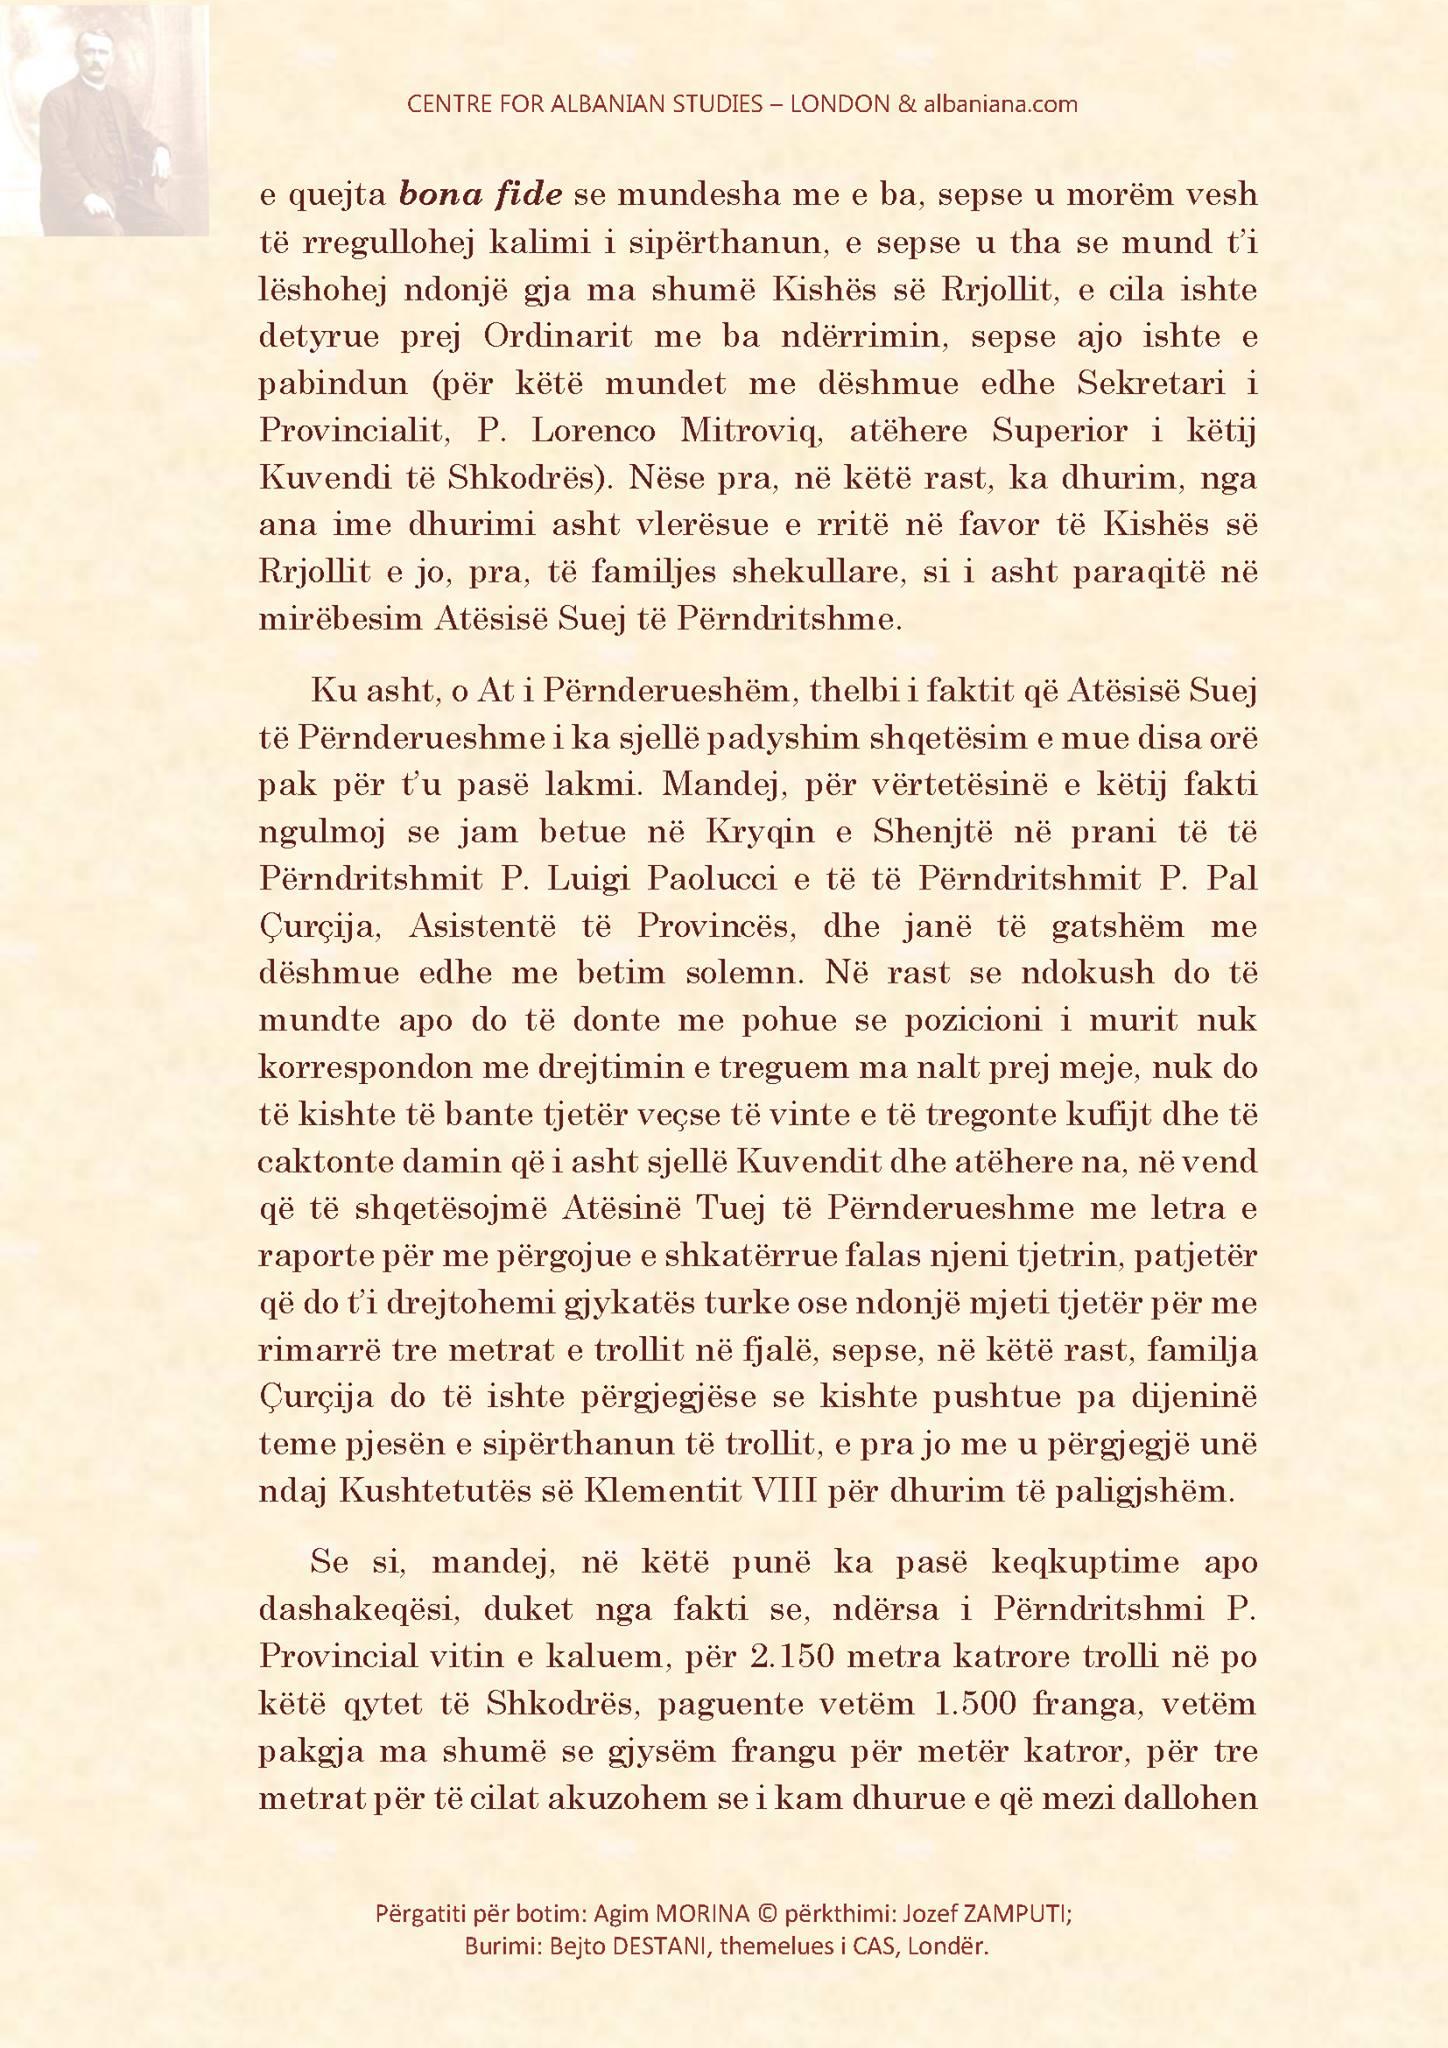 1908-05-12_fishta-2